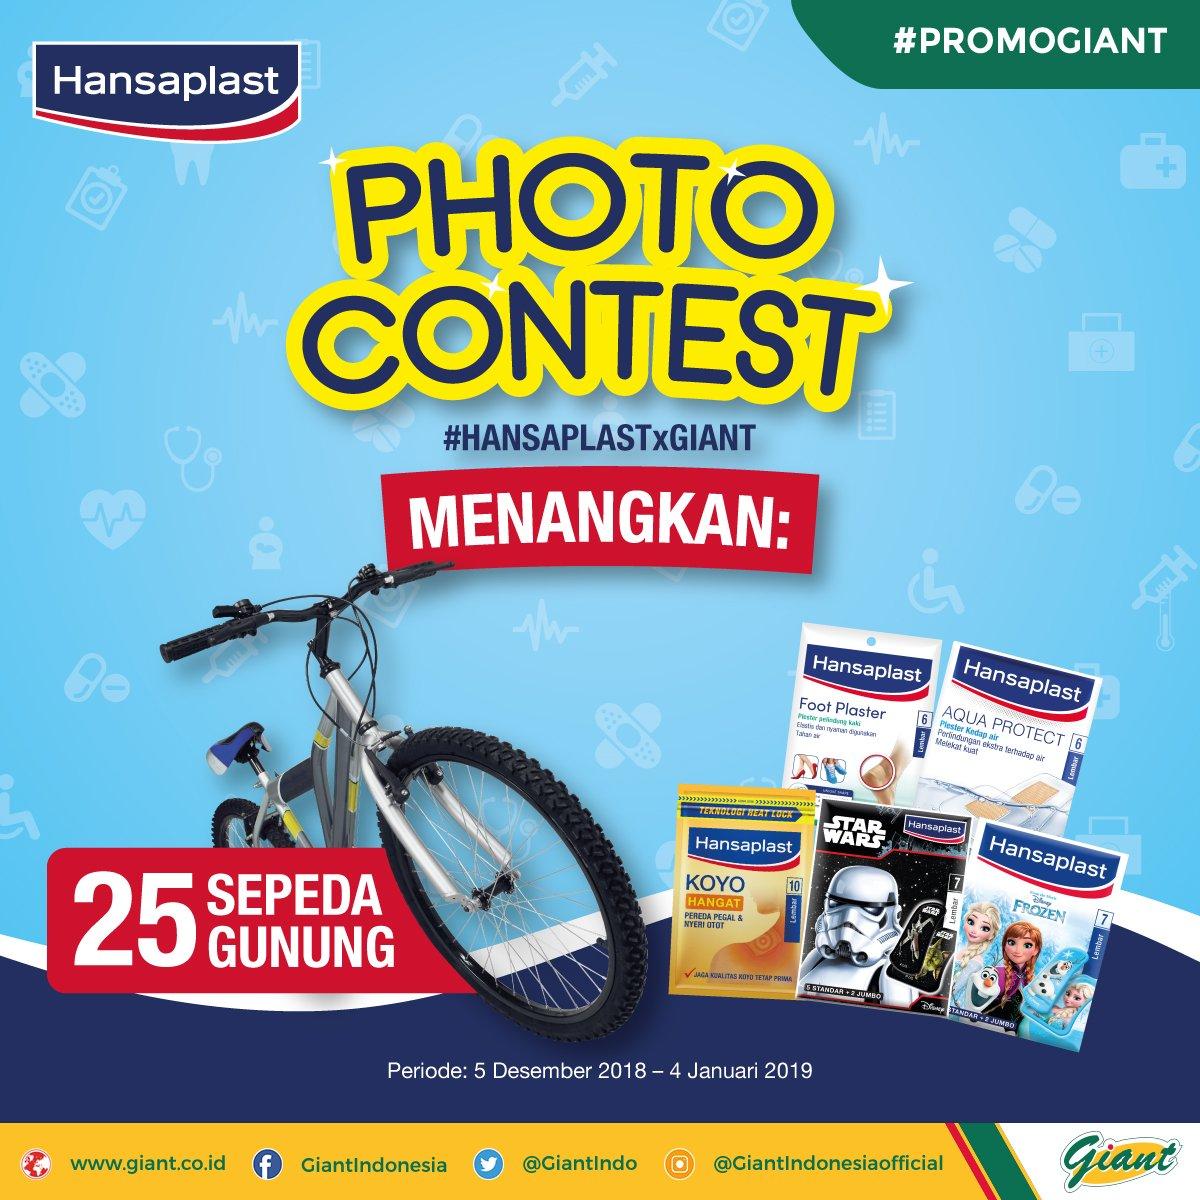 Giant - Promo Dapatkan 25 Sepeda Gunung di Photo Contest Hansaplast